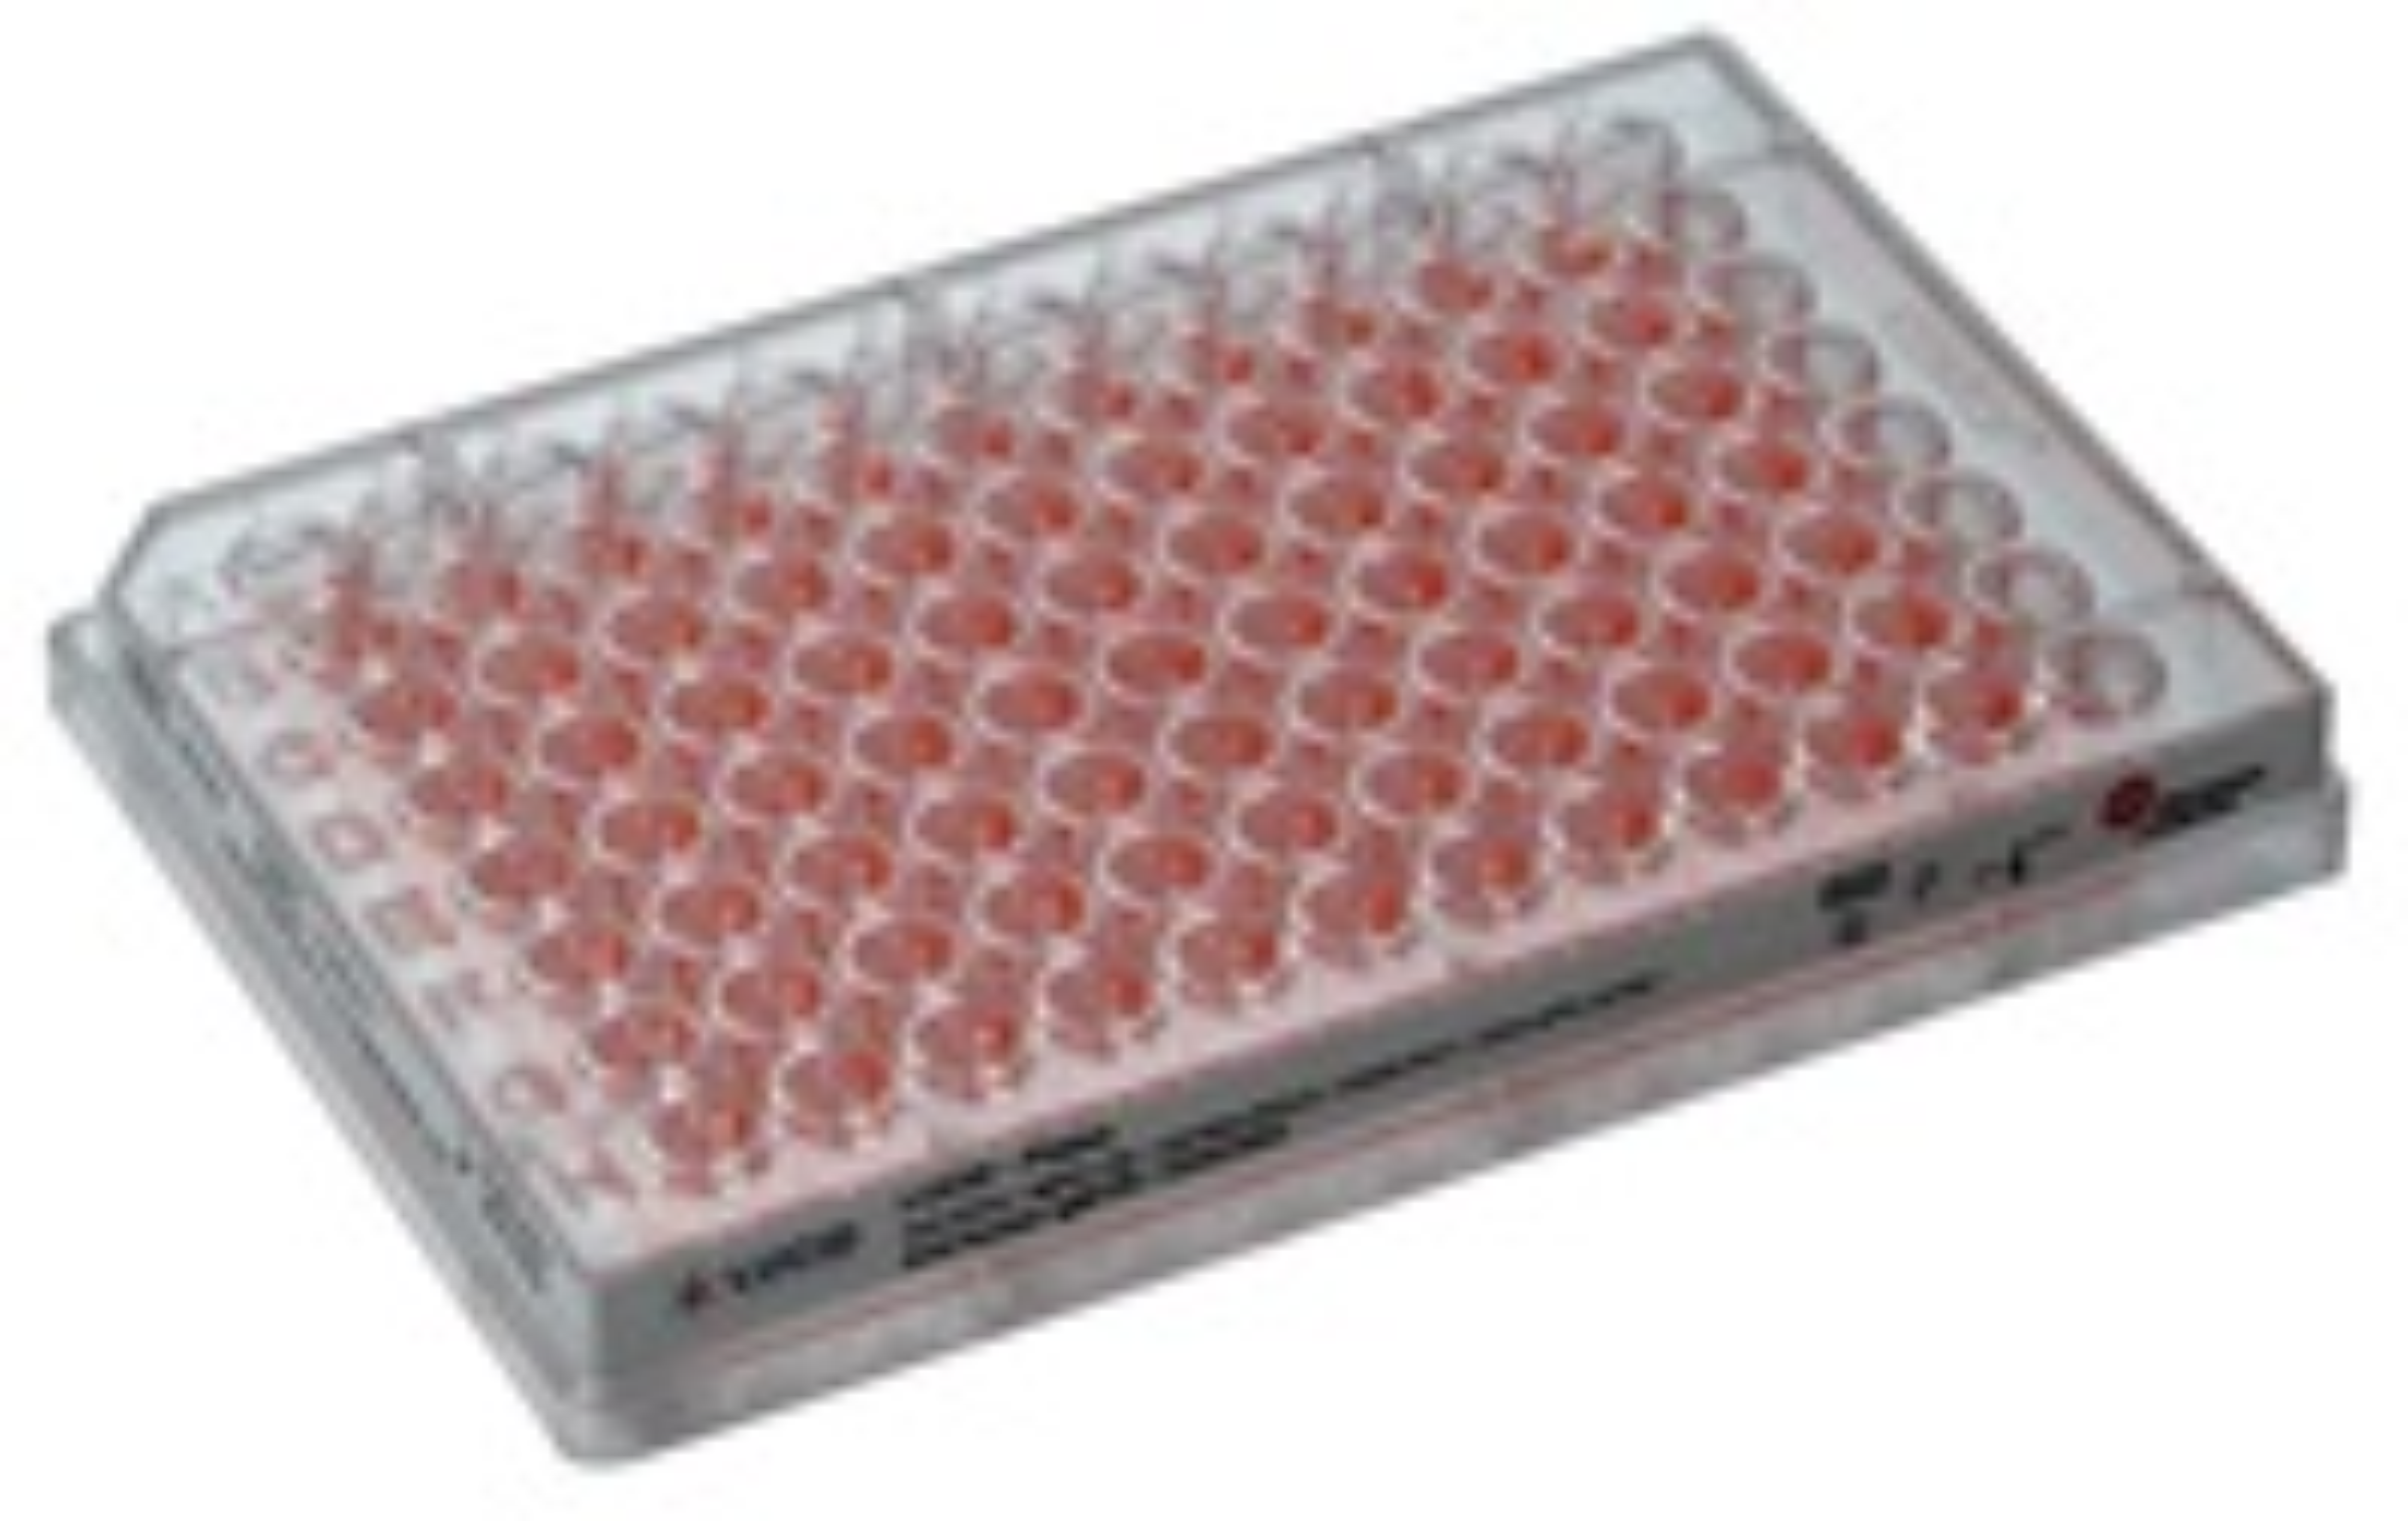 LUCID Plates